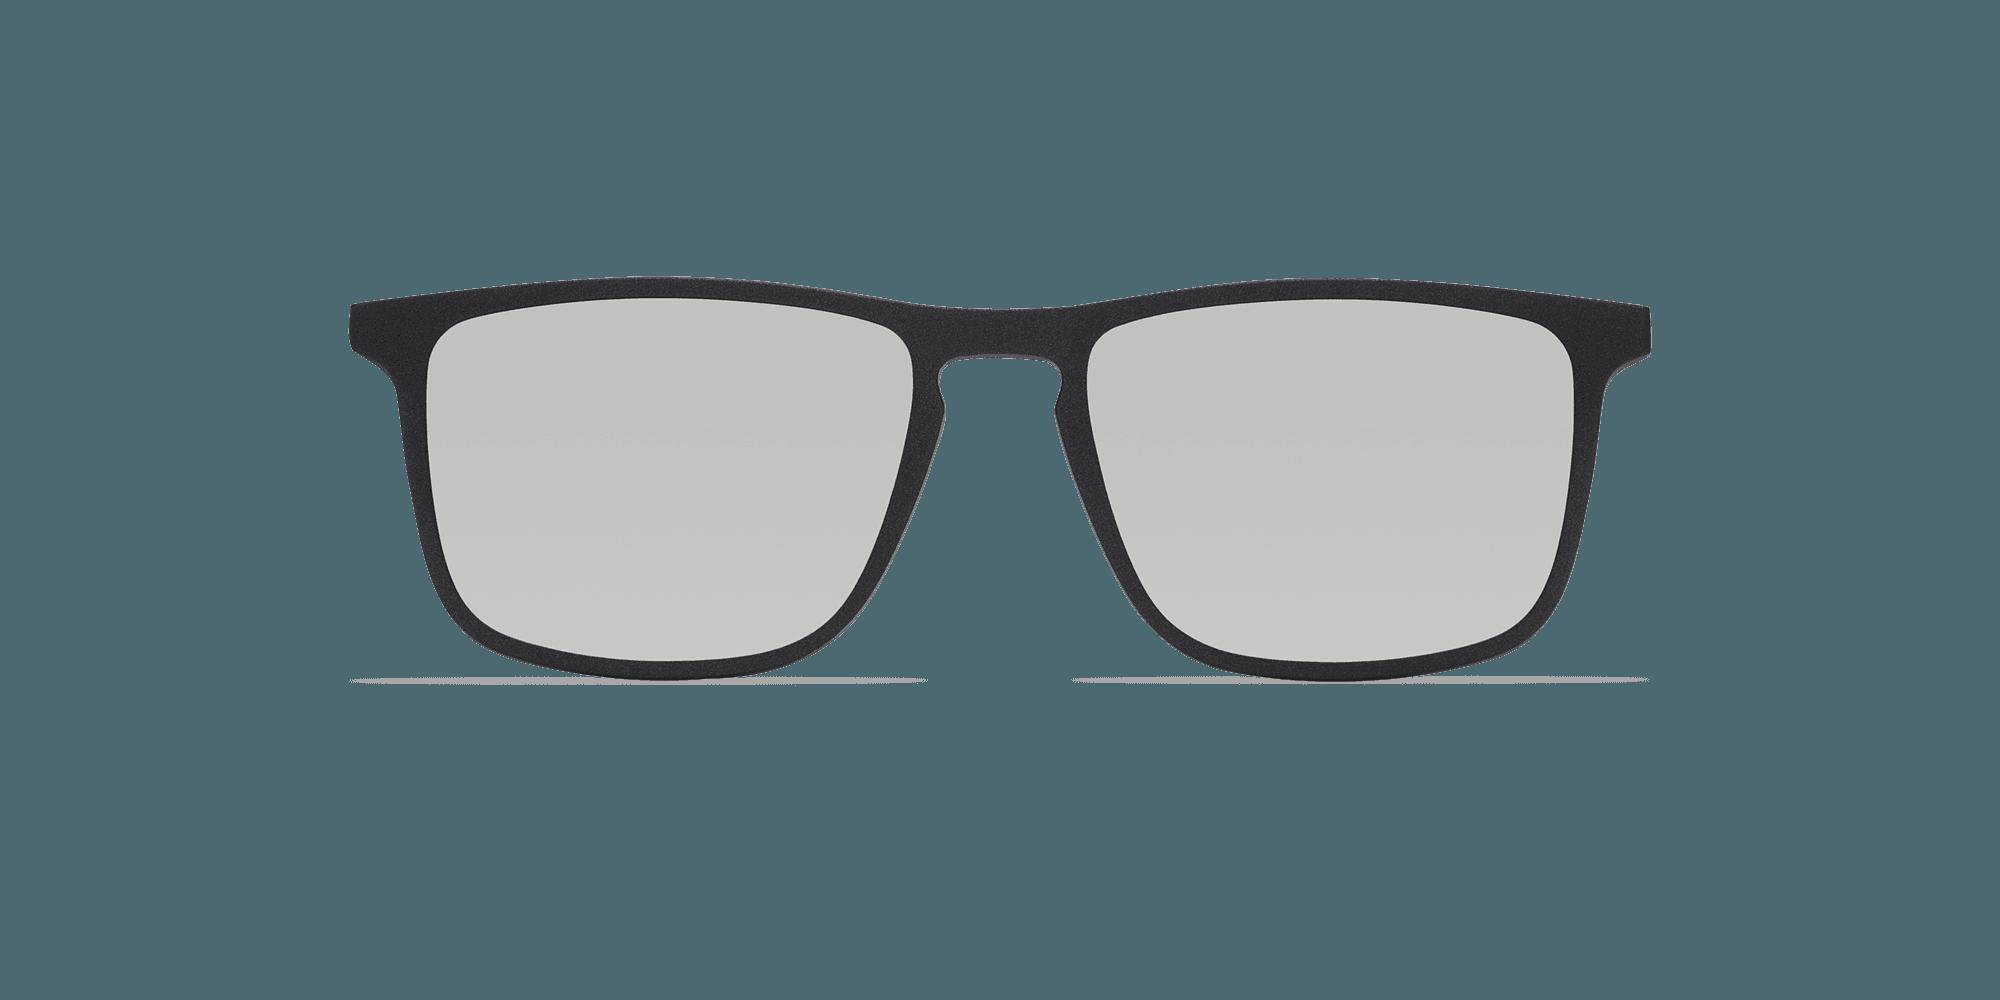 afflelou/france/products/smart_clip/clips_glasses/07630036428870_face.png